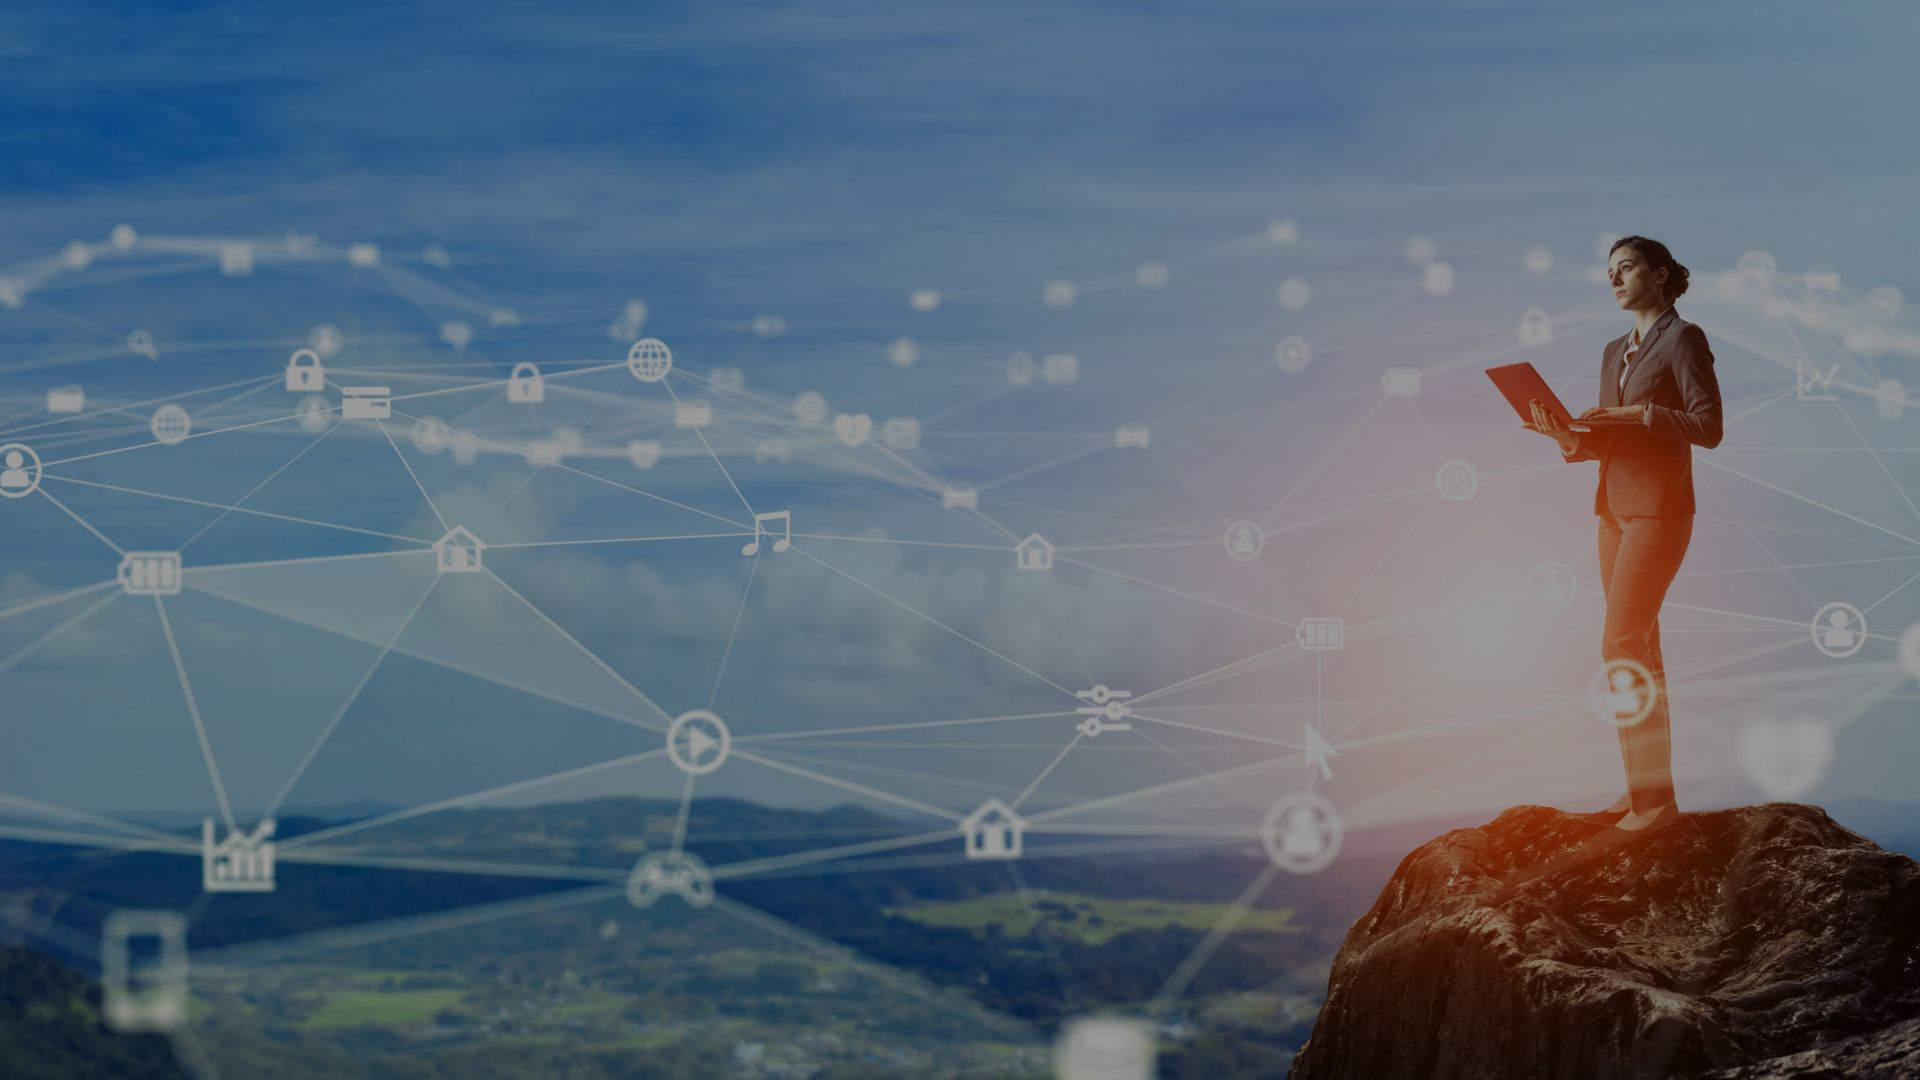 Scaling up the BIG Mountain: Big Data Predictions